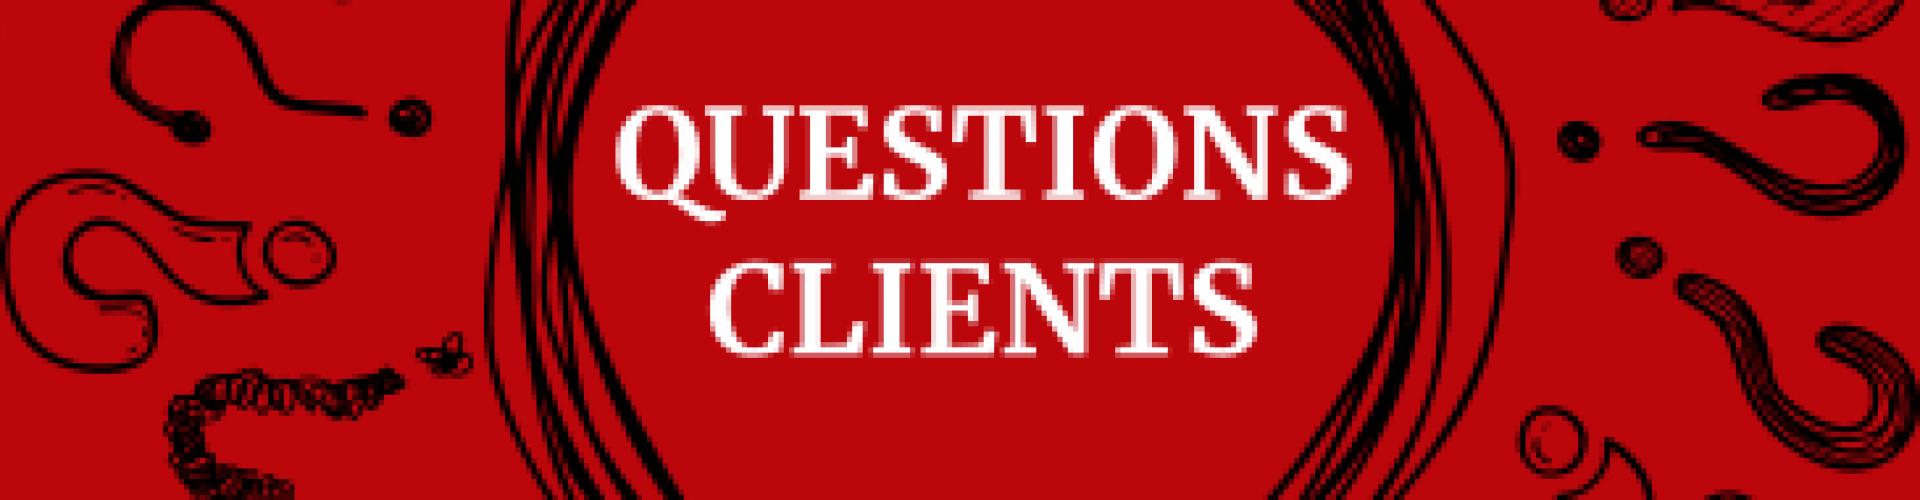 bv_questions_clients_365px